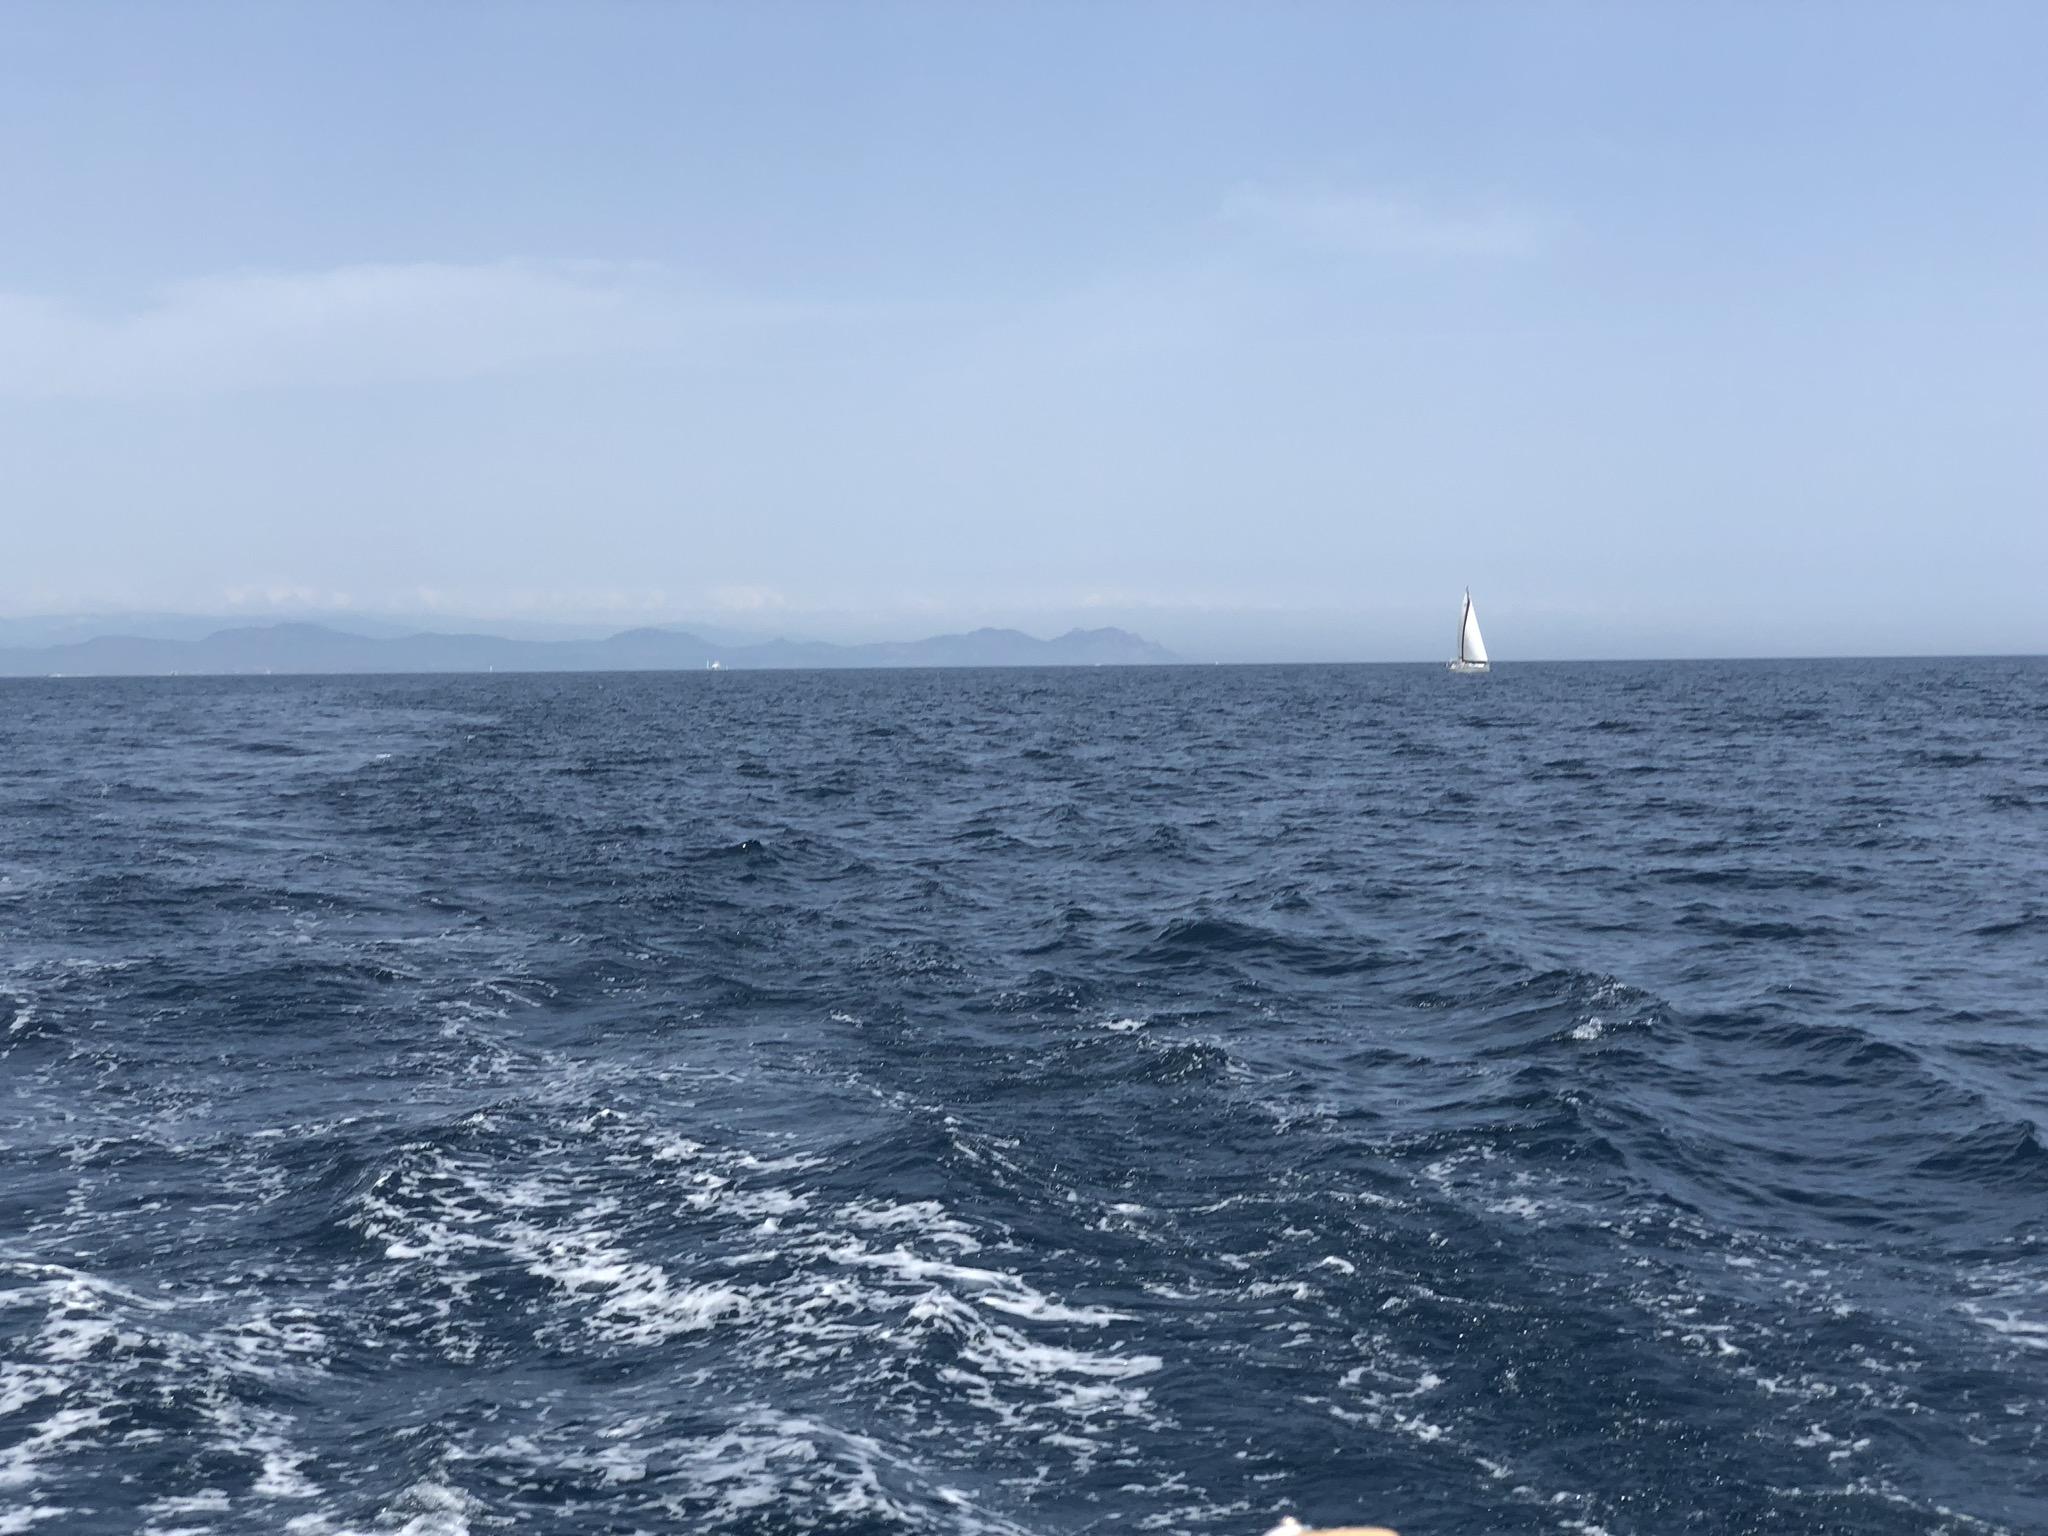 Photo_St.Tropez_SailBoat_View2.jpg